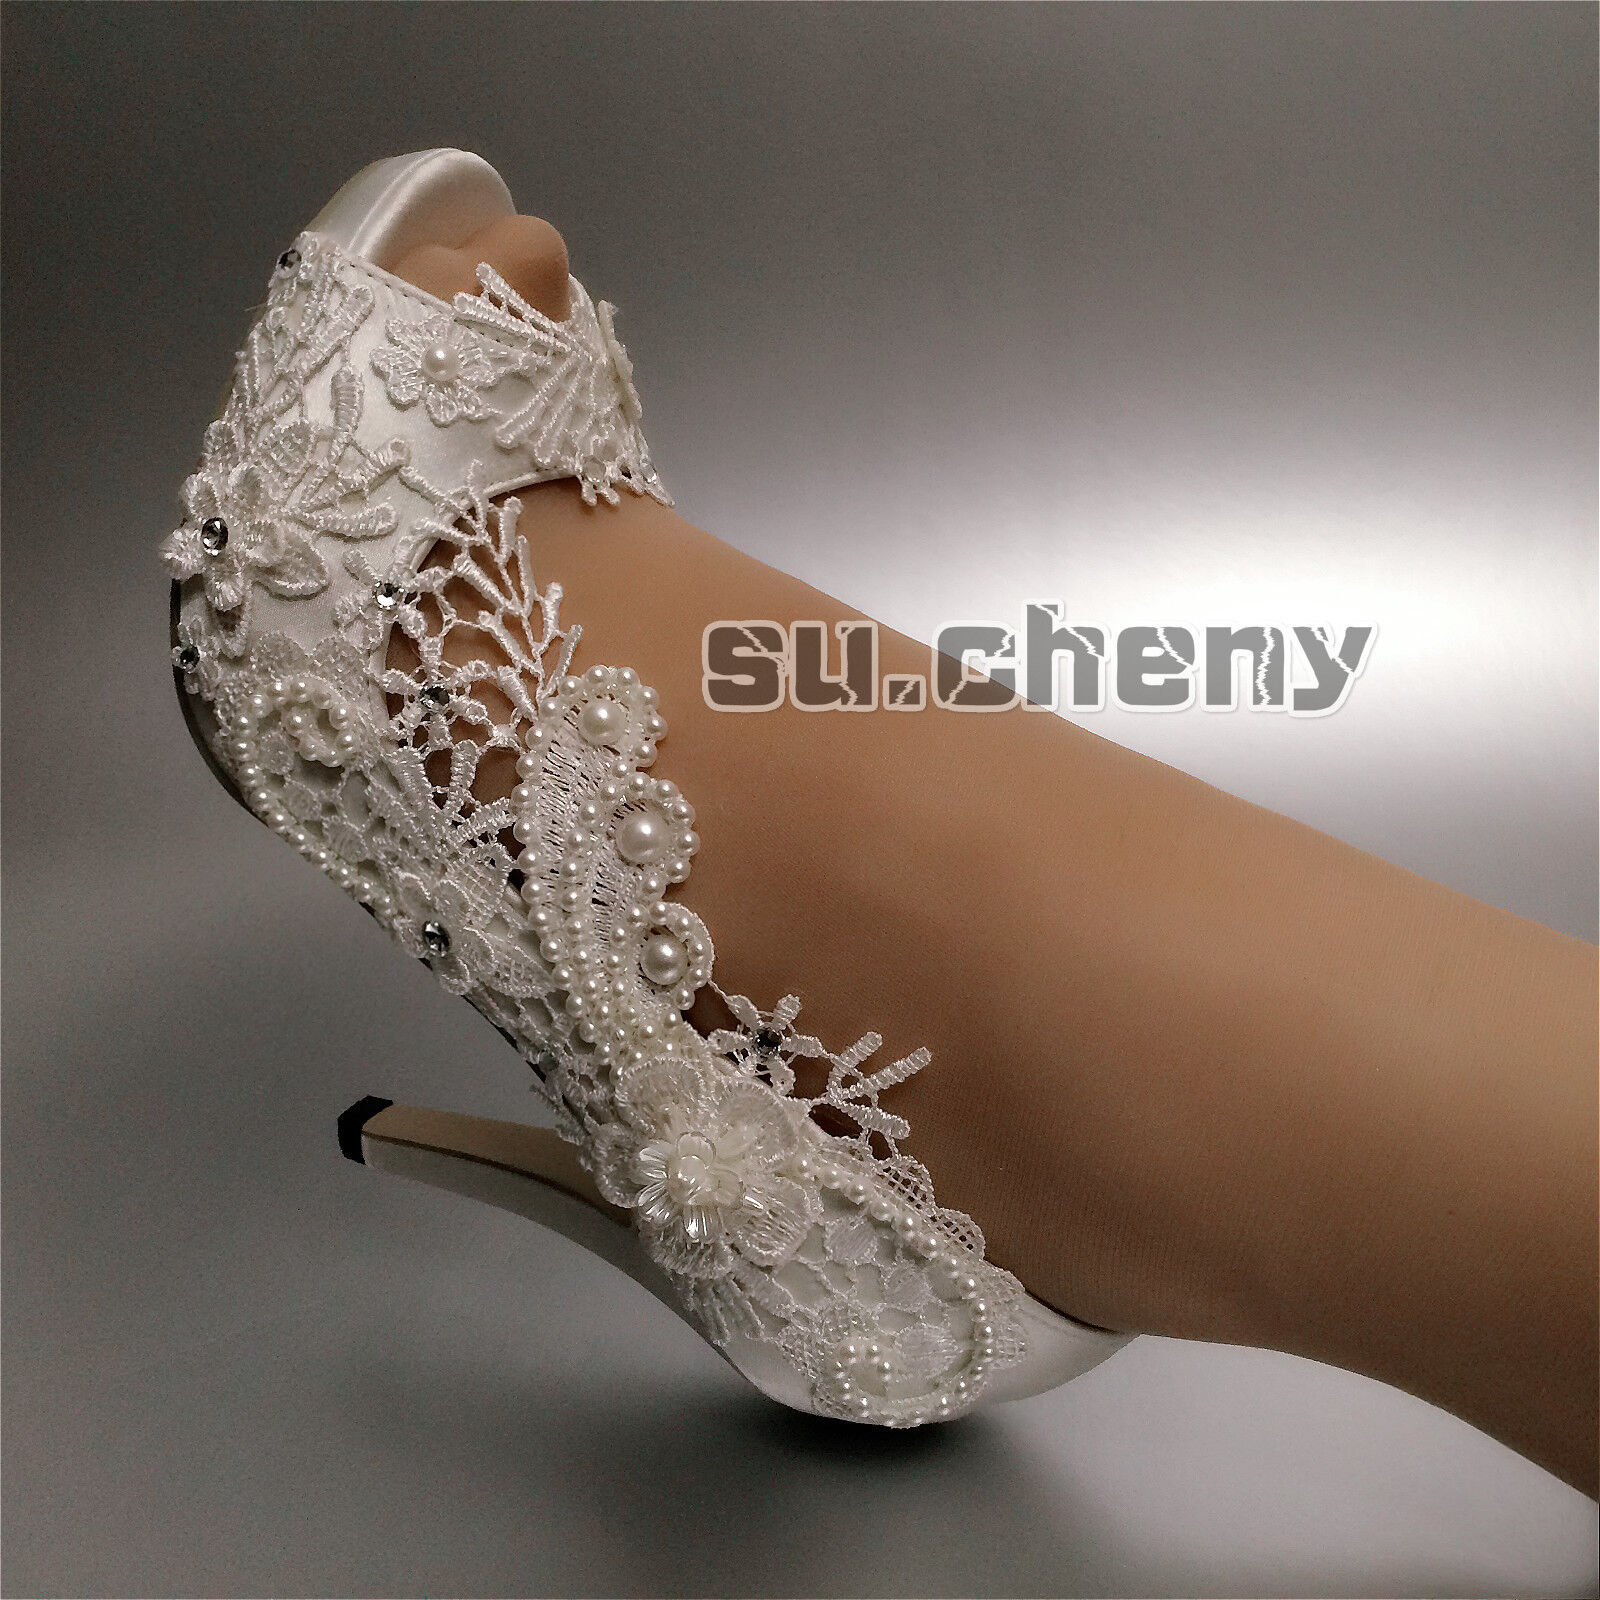 Su.cheny Su.cheny Su.cheny 3  4  heel satin Weiß ivory pearls lace peep toe Wedding Bridal schuhe 344b92